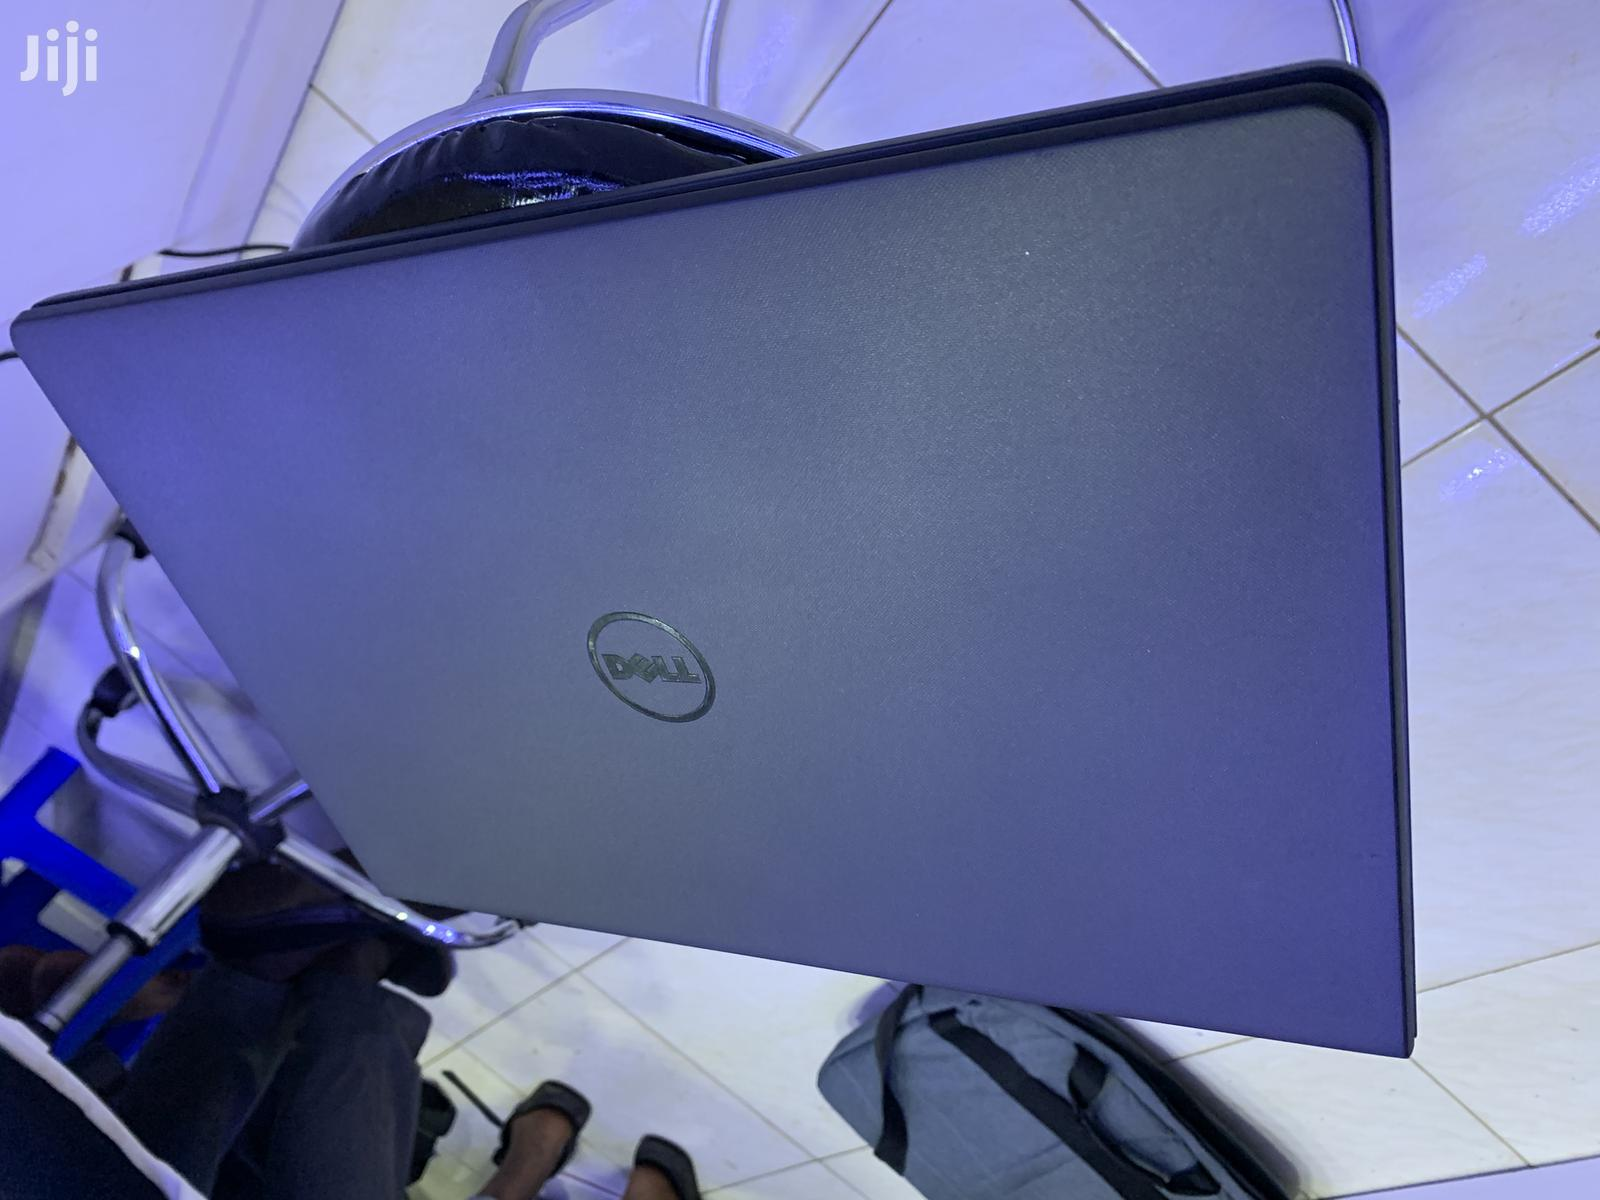 Laptop Dell Inspiron 15 3000 4GB Intel Core i7 500GB | Laptops & Computers for sale in Kampala, Central Region, Uganda